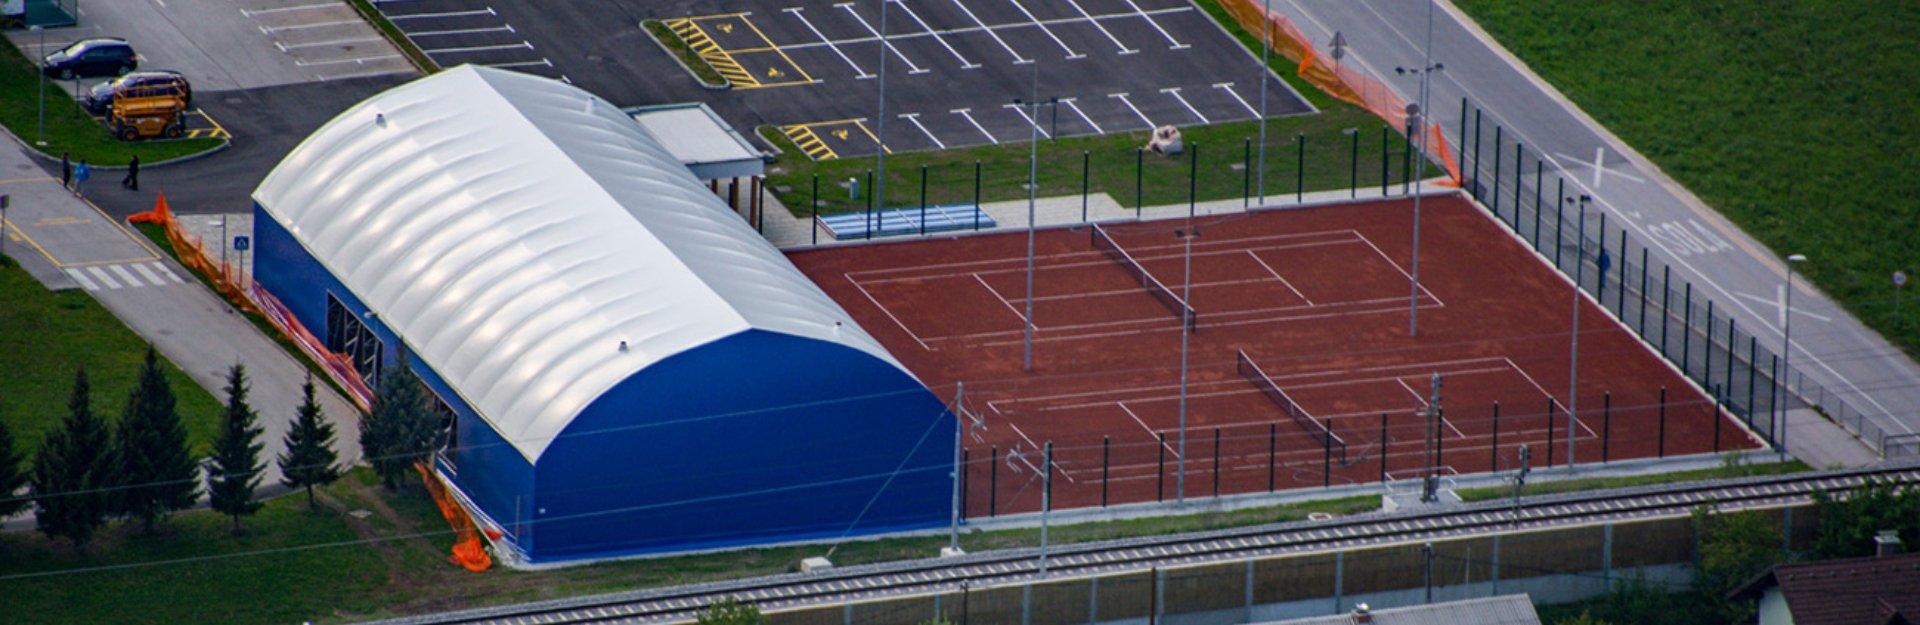 Tenis center Laško